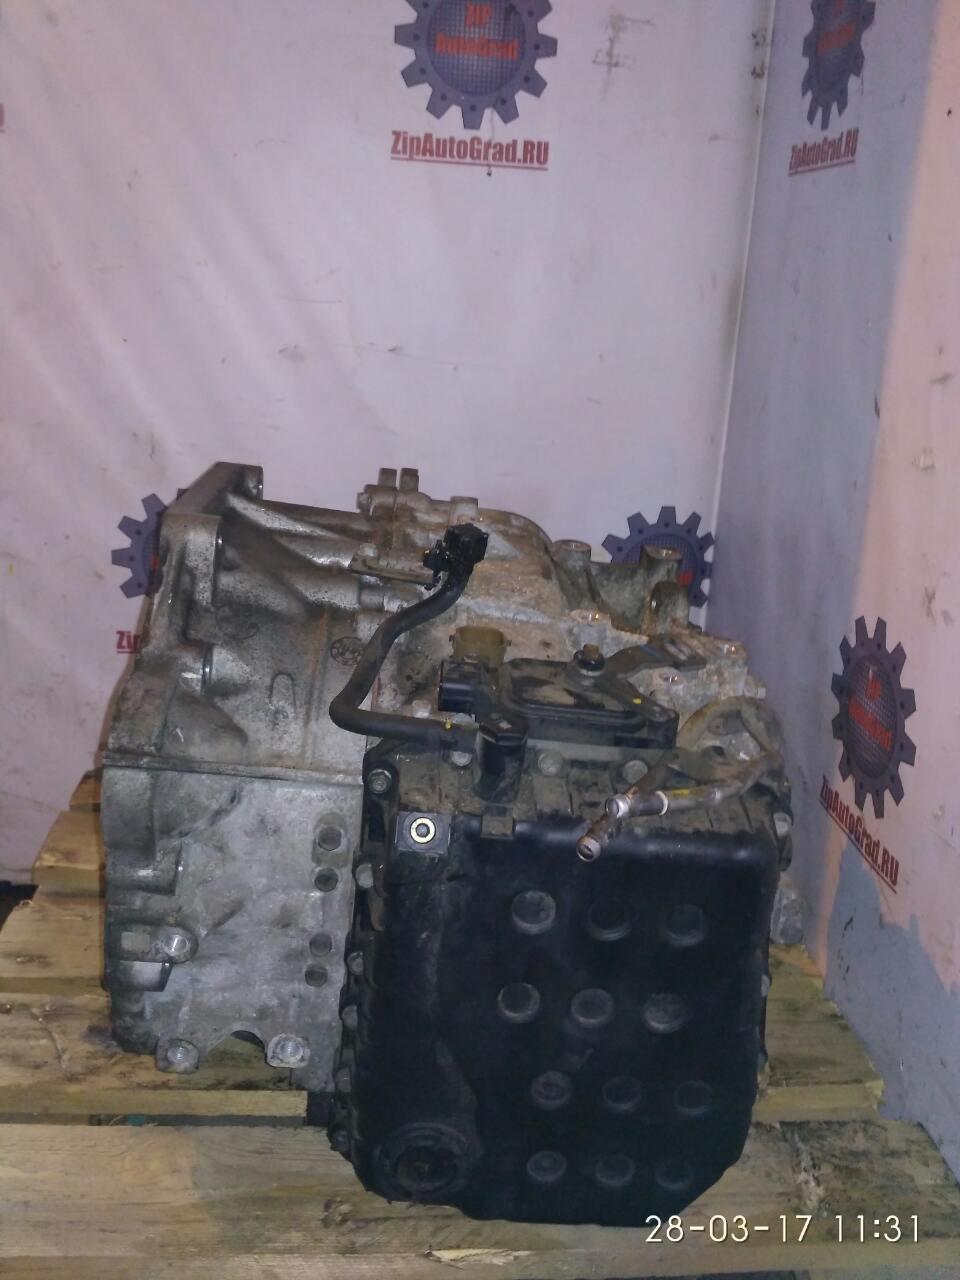 АКПП A6LF2 Kia Sportage. Кузов: 3. D4HA. , 2.0л., 136л.с.  фото 2